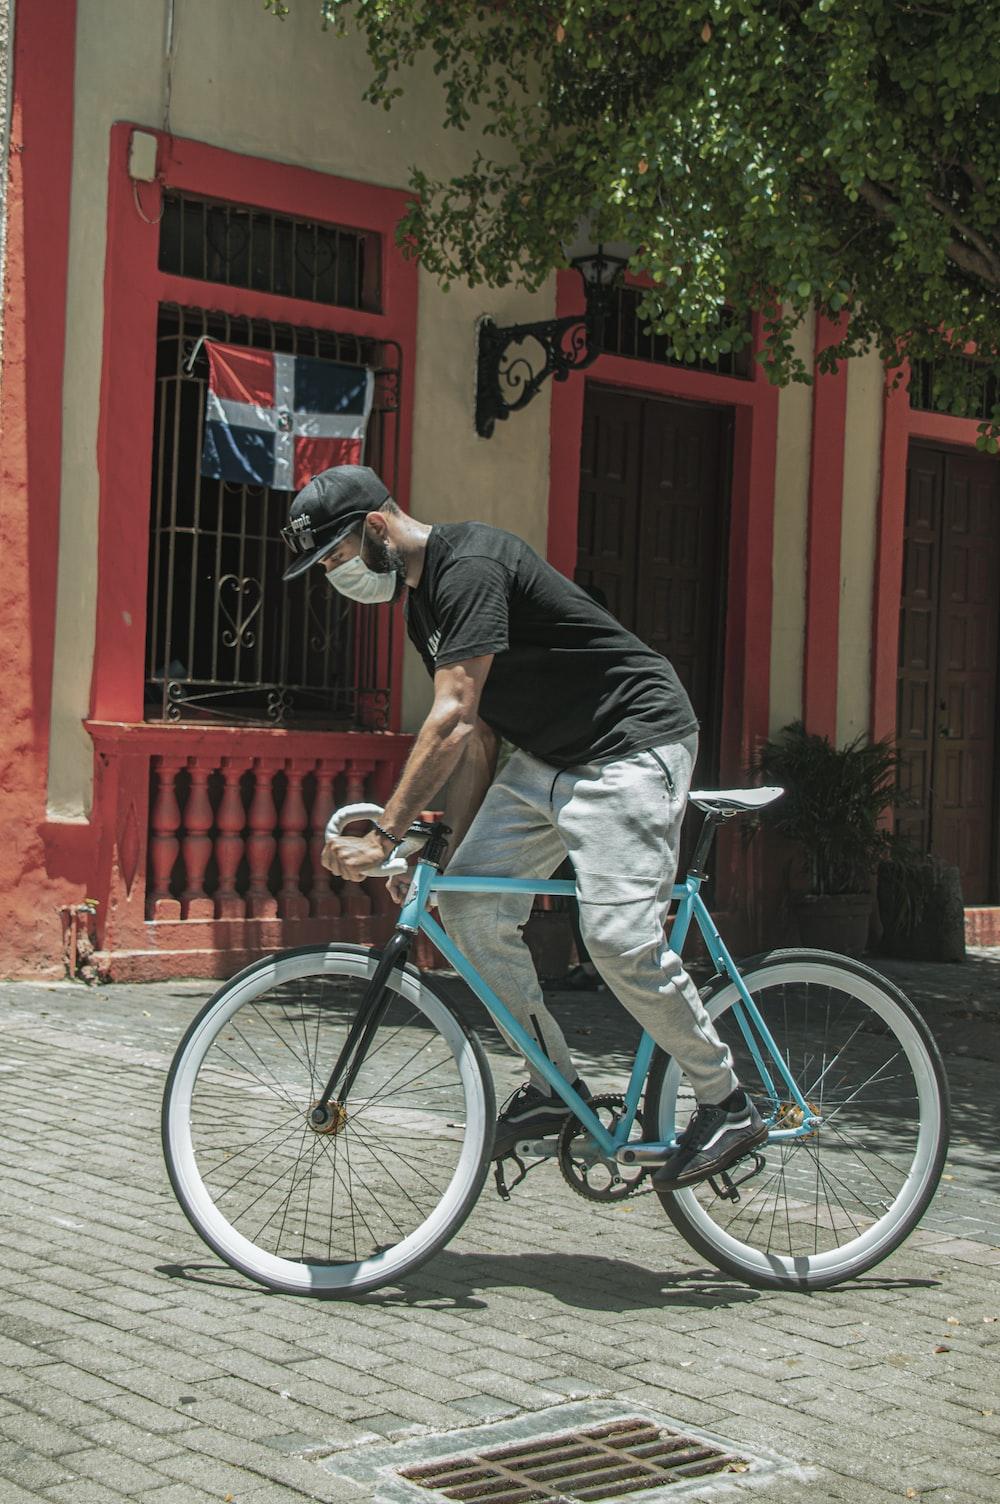 man in black t-shirt riding on teal bicycle during daytime